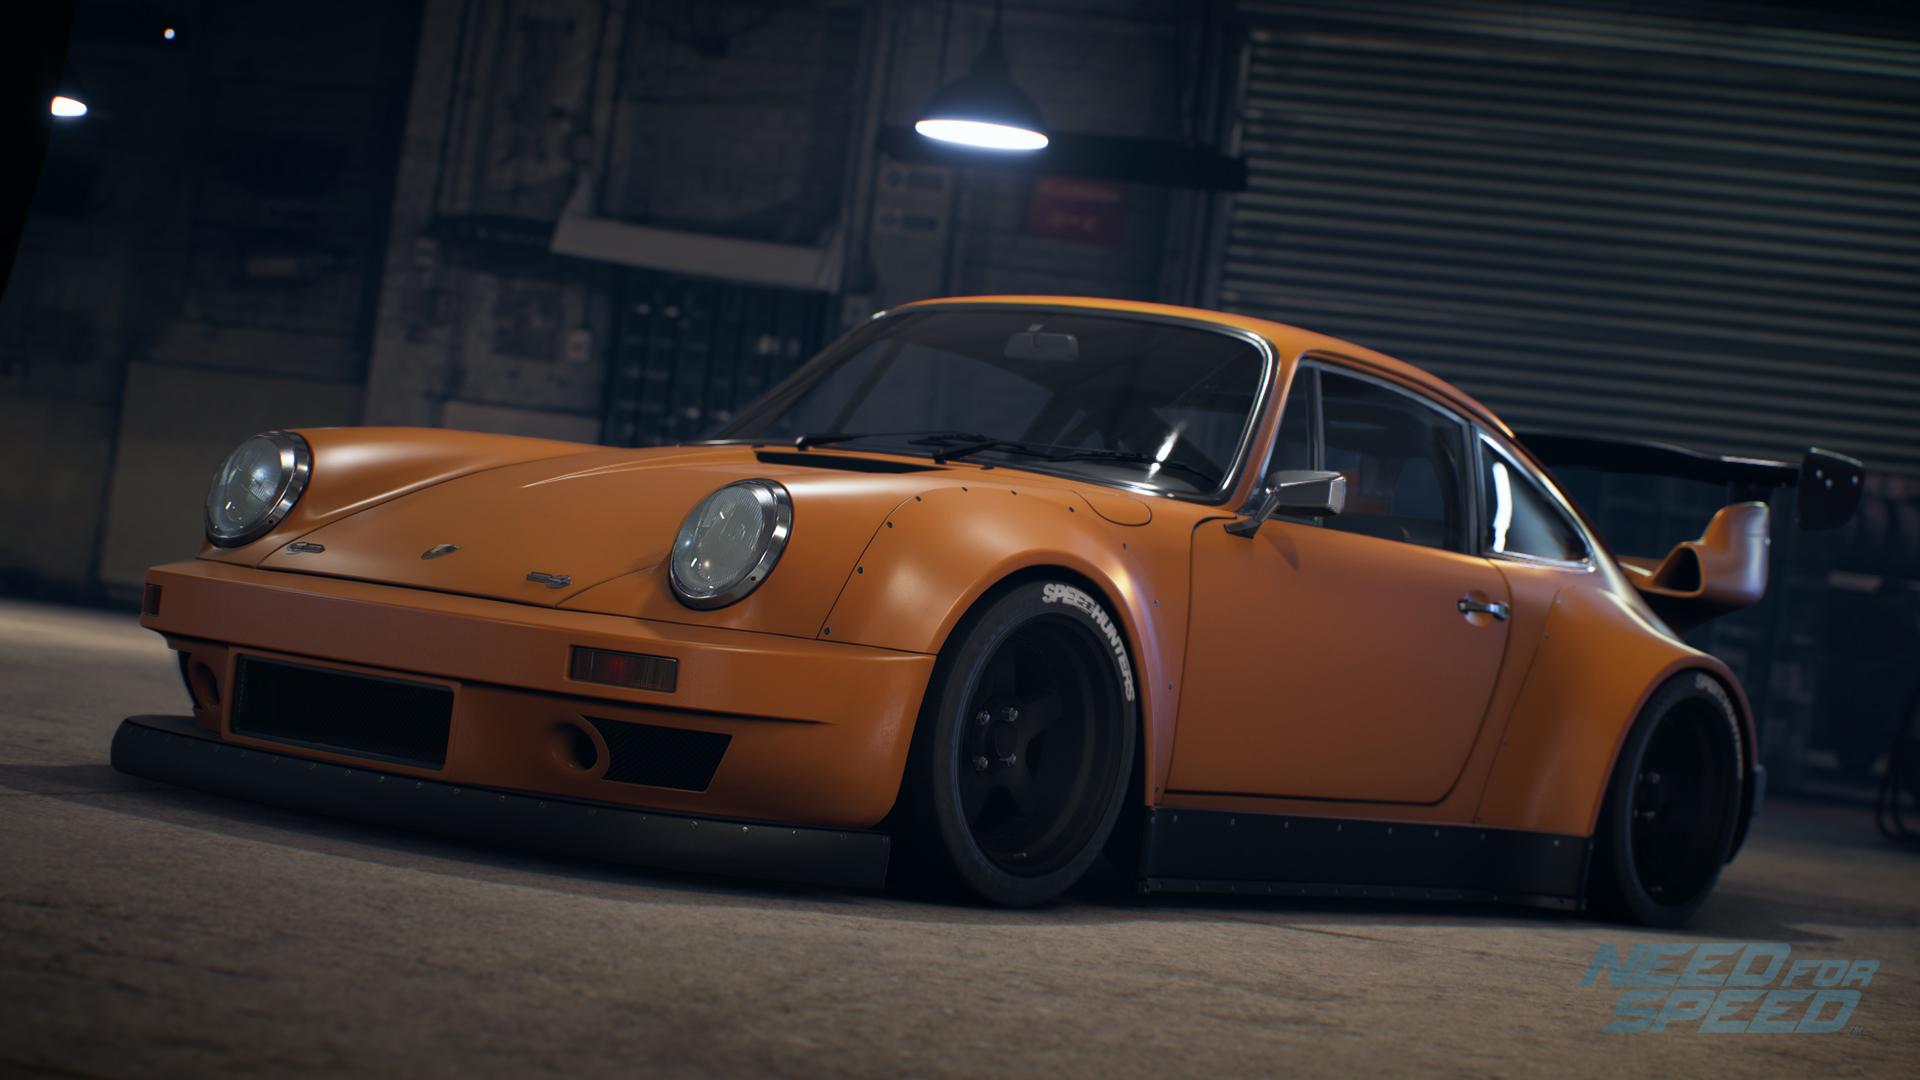 Krásné obrázky z Need for Speed 114110